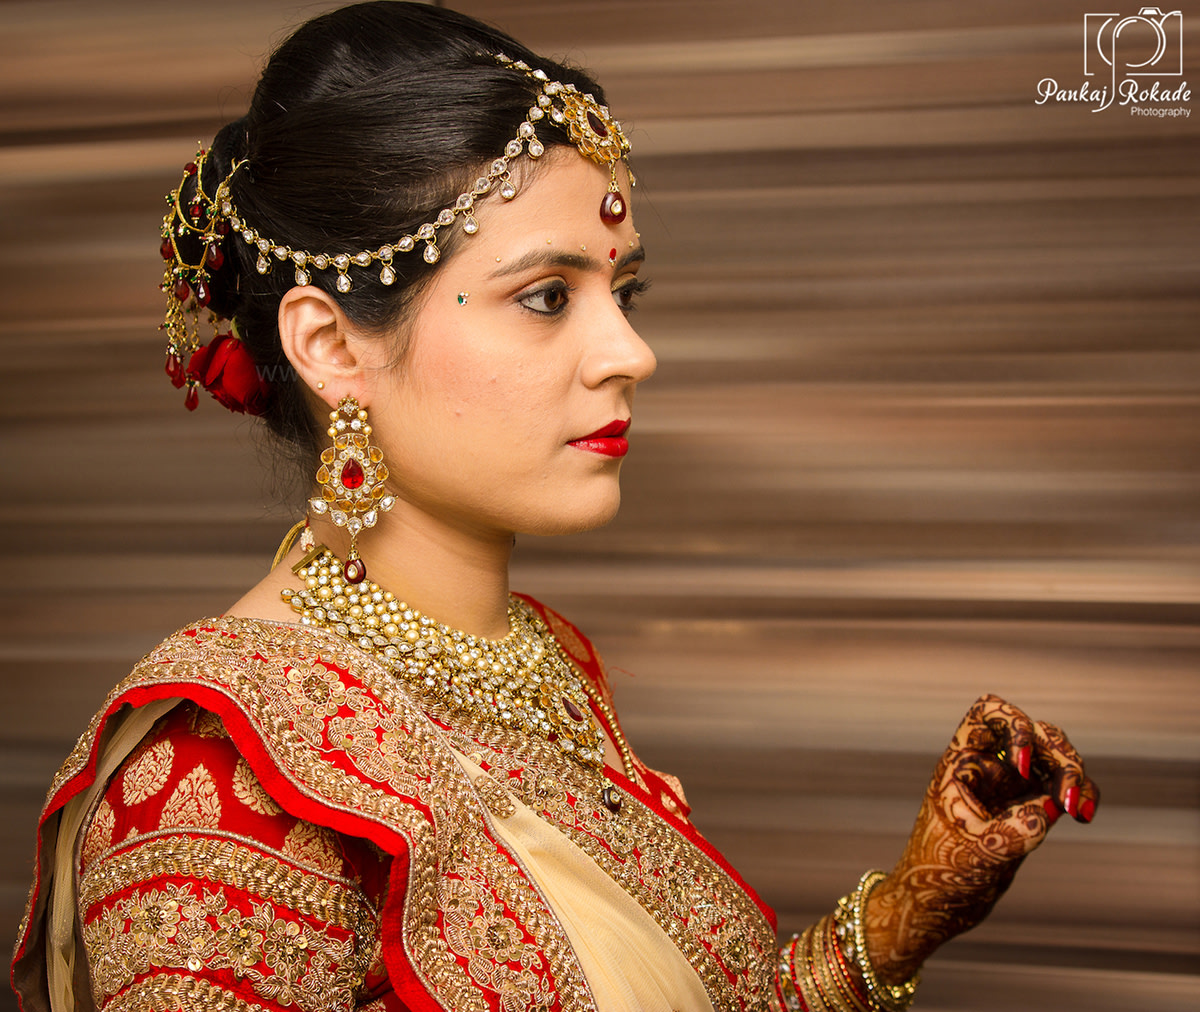 A beautiful portrait of the bride by Pankaj Rokade Photography  Wedding-photography | Weddings Photos & Ideas